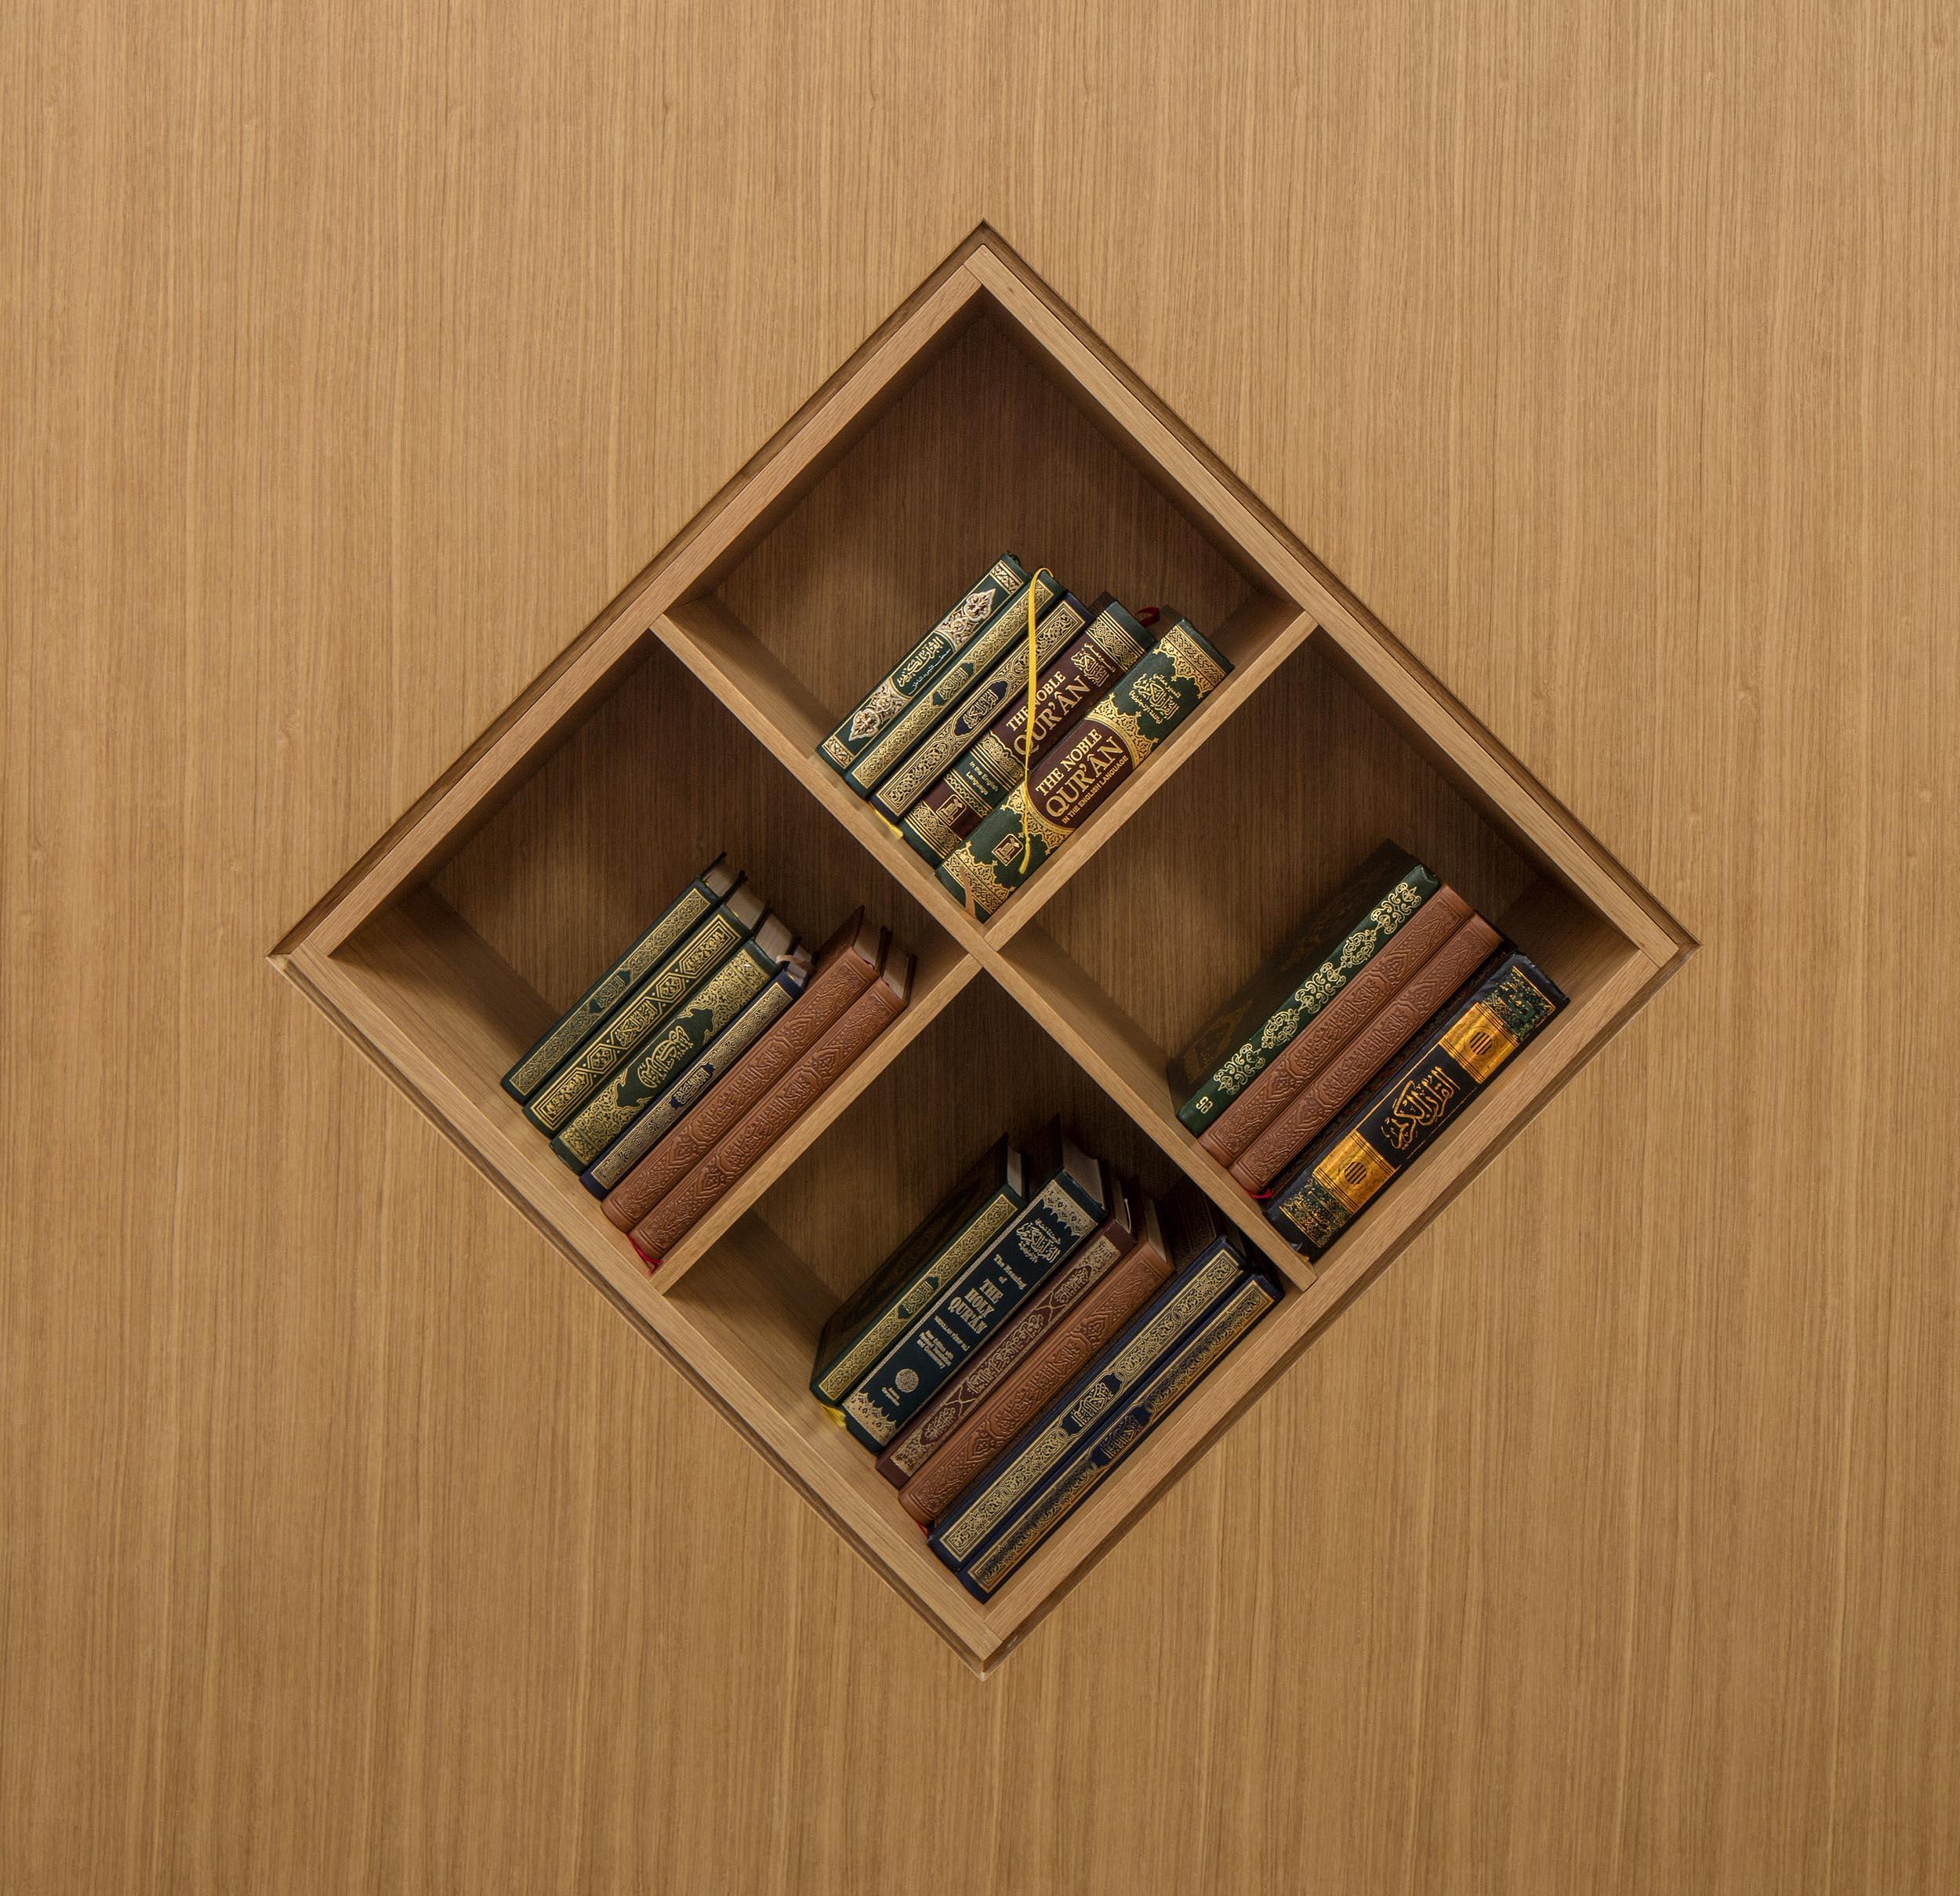 Cambridge Mosque Bookshelf in Prayer Hall by Marks Barfield Architects, photo by Morley von Sternberg